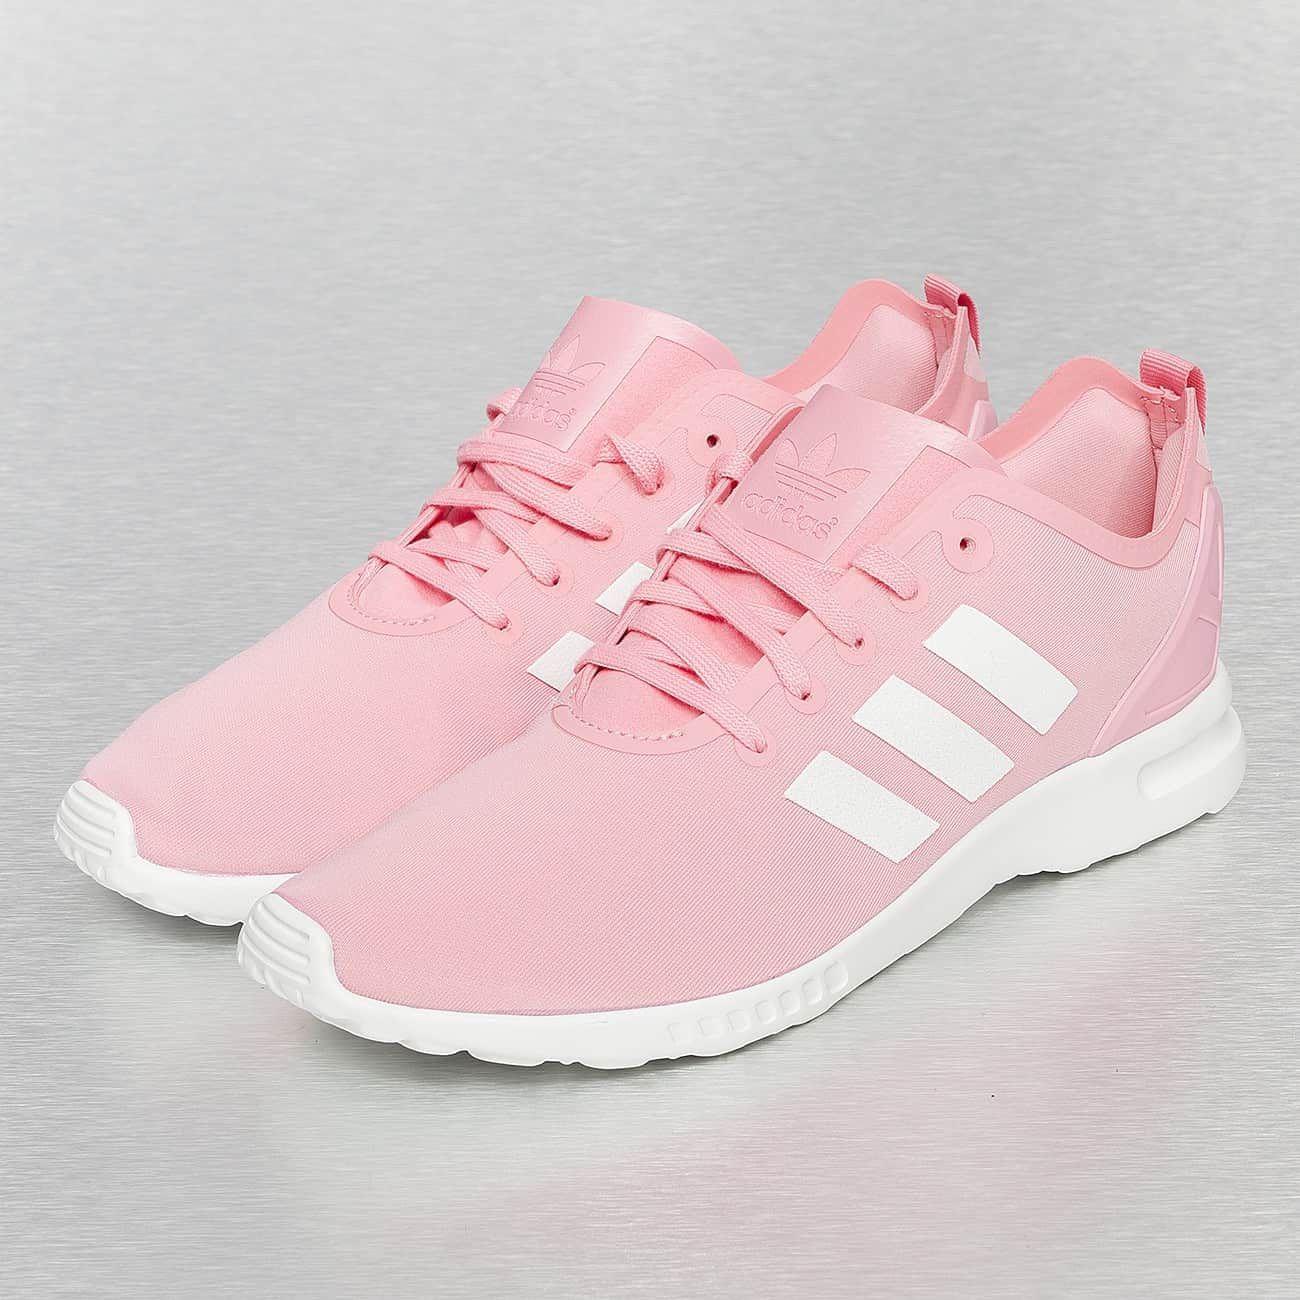 Adidas Sneaker Pink Schuhe Damen Schuhe Damen Sneaker Schuhe